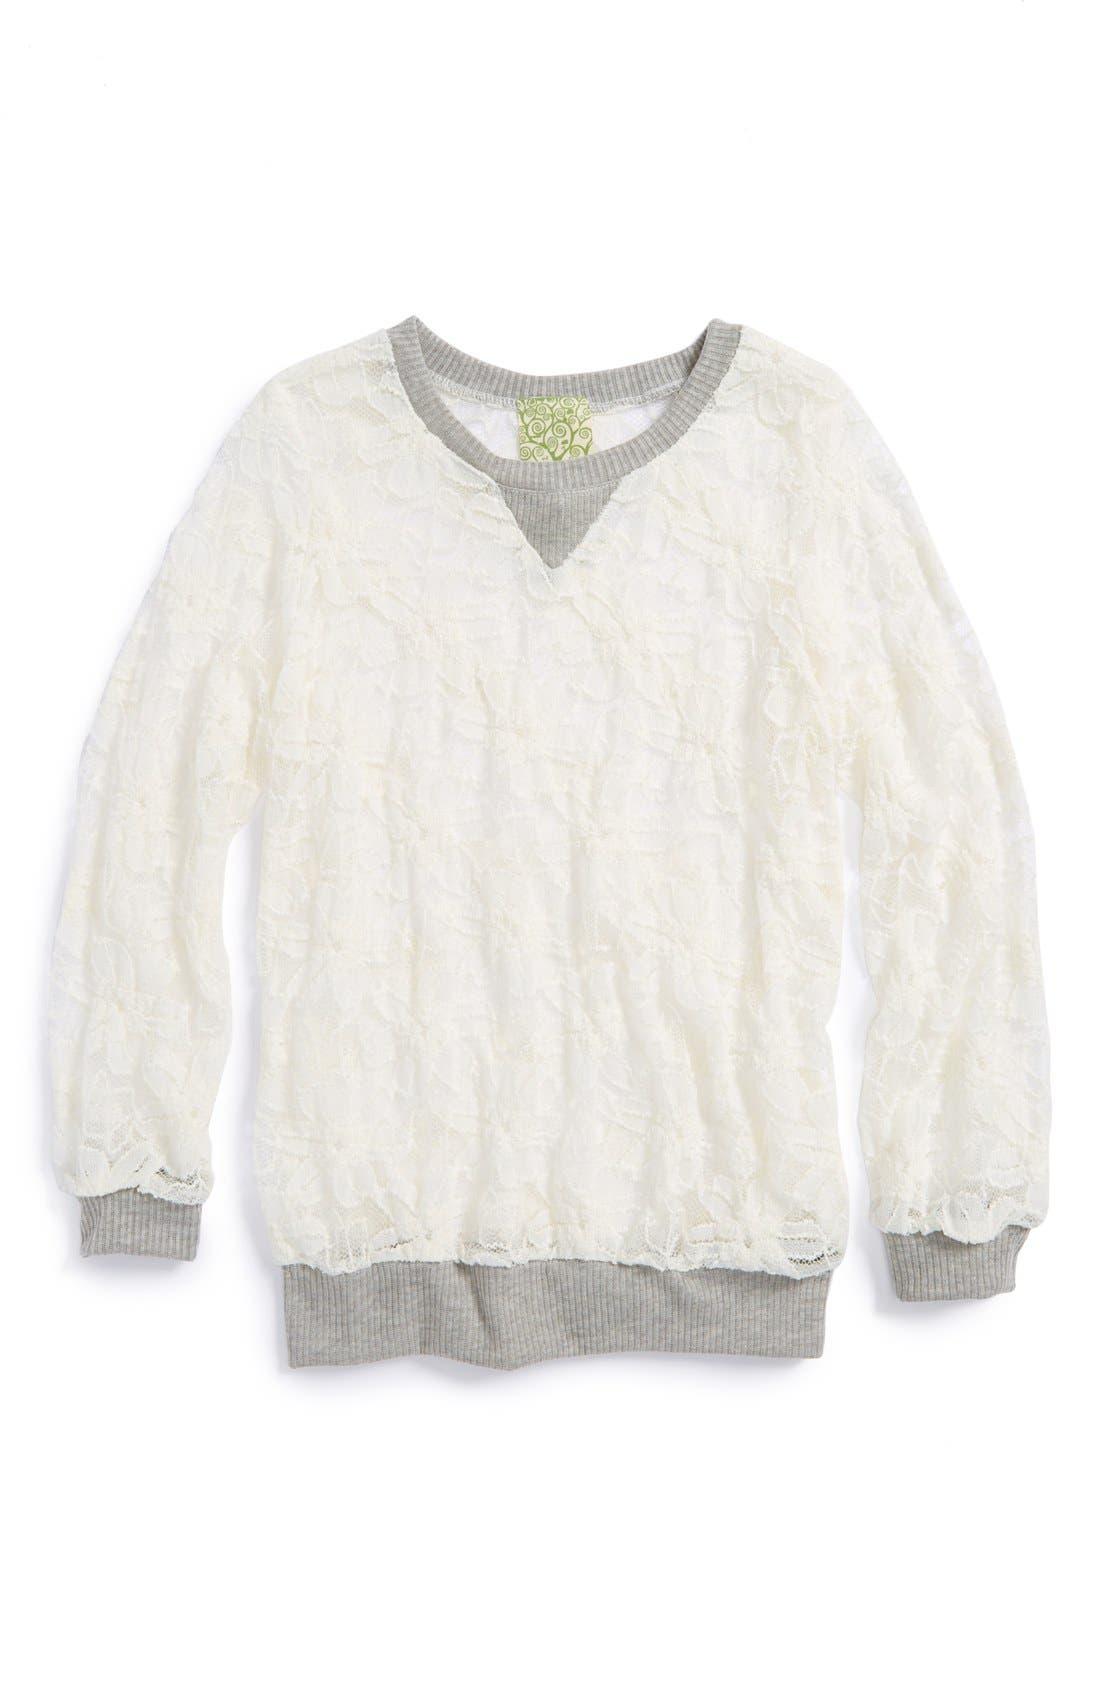 Alternate Image 1 Selected - Kiddo Sheer Floral Lace Sweatshirt (Big Girls)